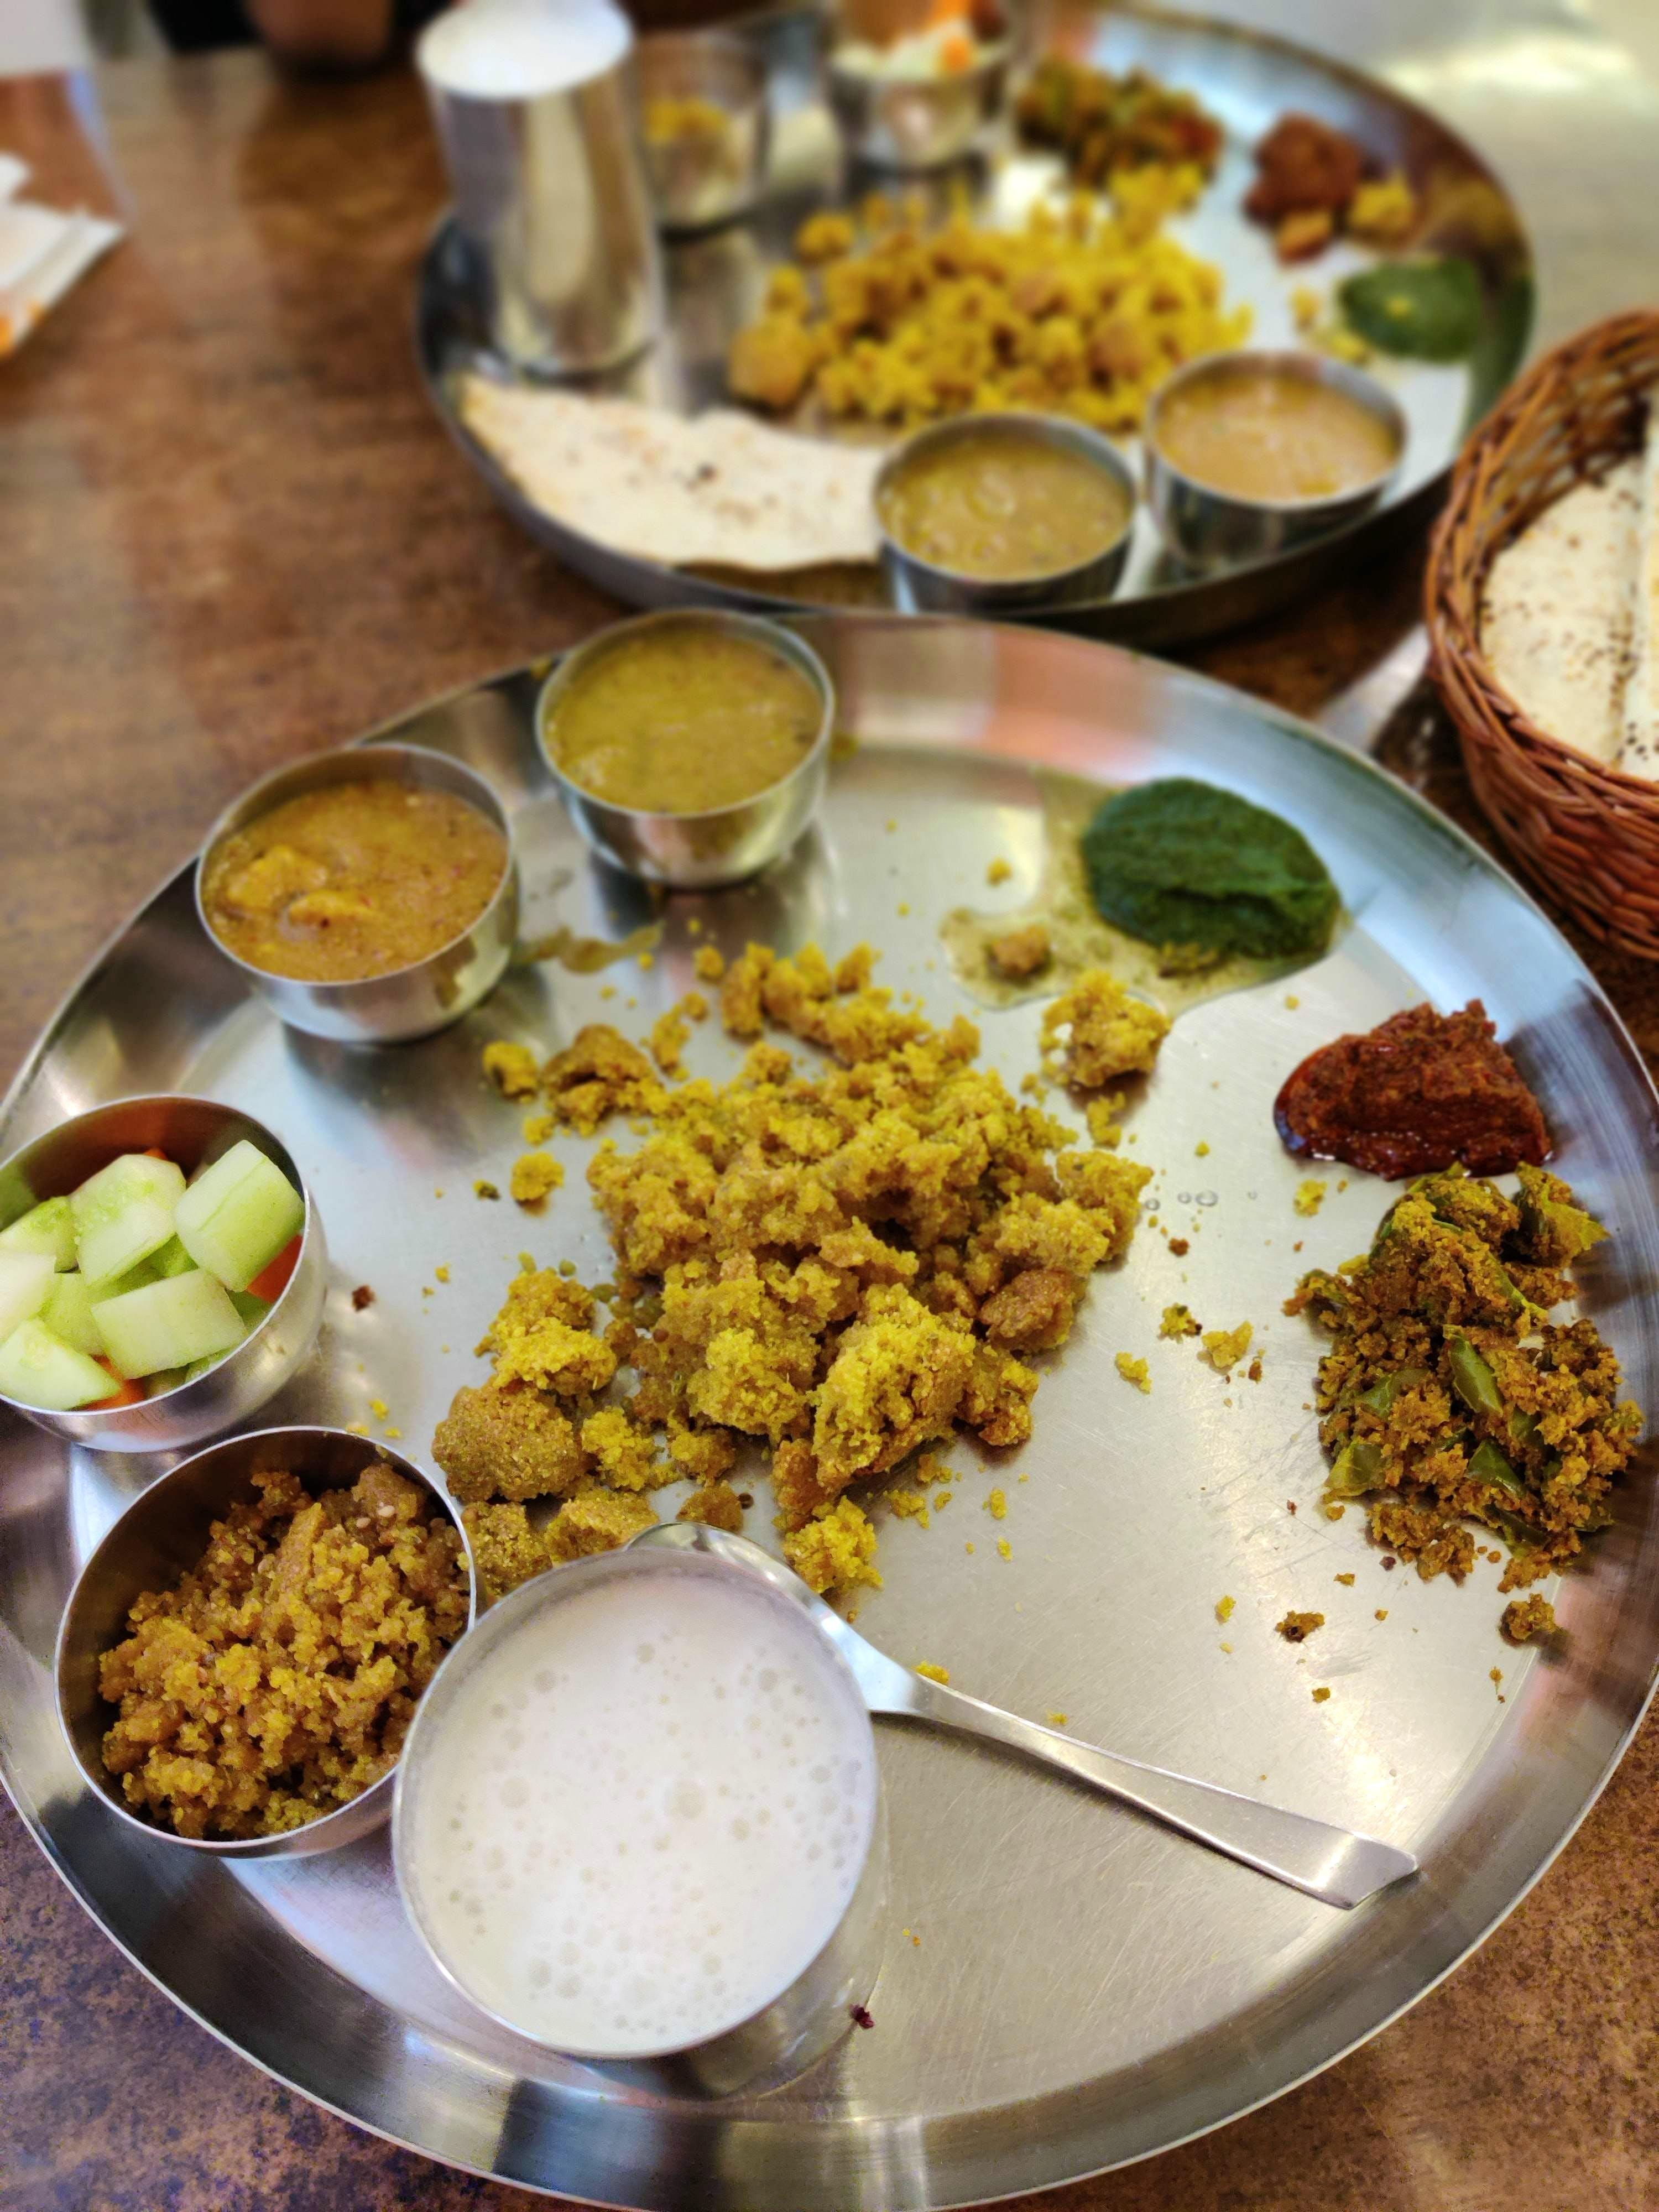 Dish,Food,Cuisine,Meal,Ingredient,Produce,Vegetarian food,Staple food,Brunch,Indian cuisine